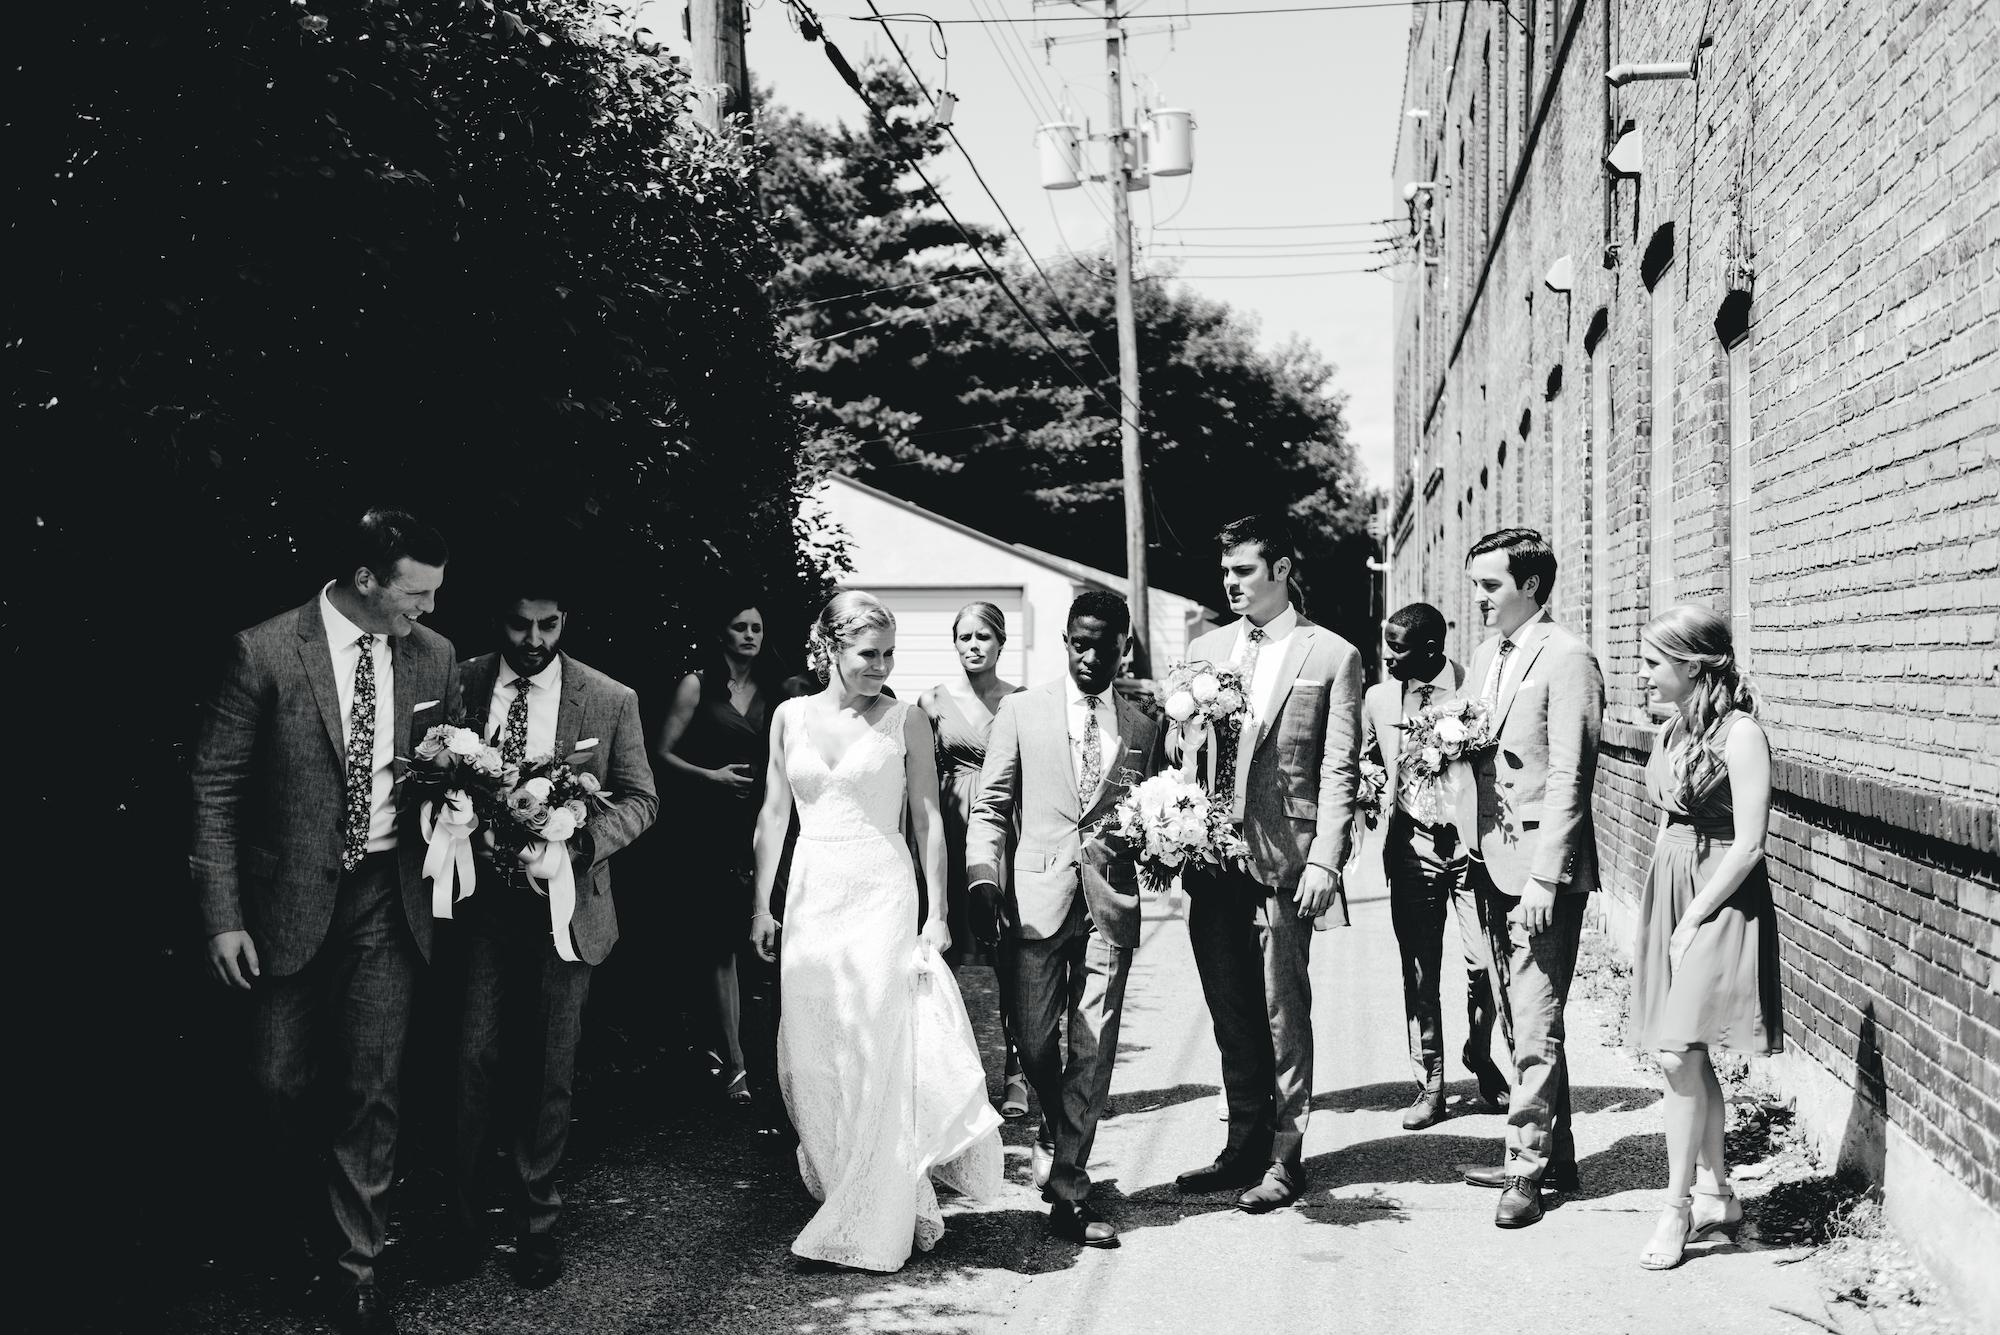 Roy_Son_Photo_Acowsay_Cinema_MN_Wedding_16.jpg